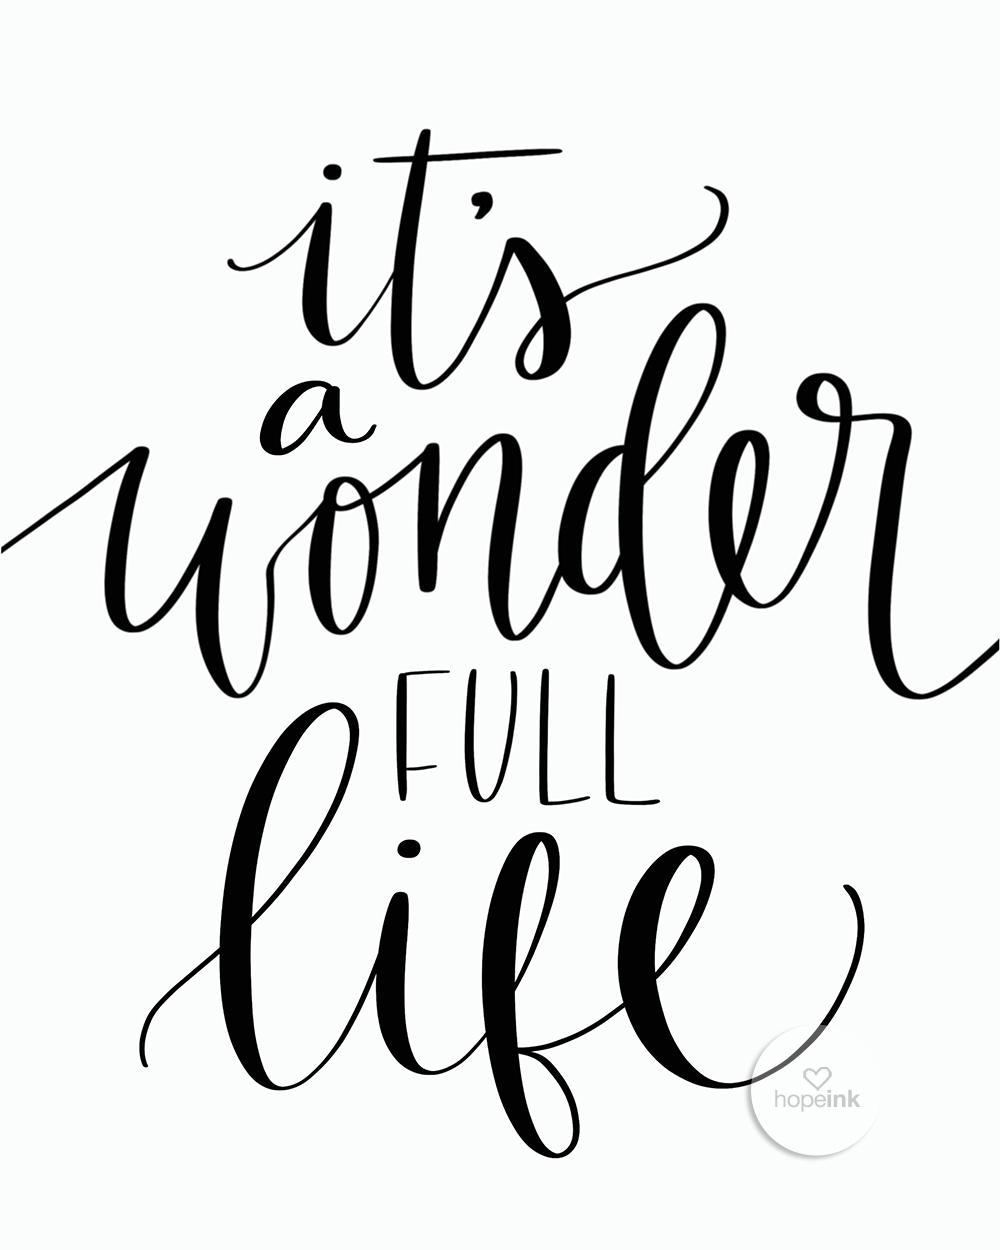 Its A Wonderful Life | Hand Lettered Wall Art | Hope Ink.jpg